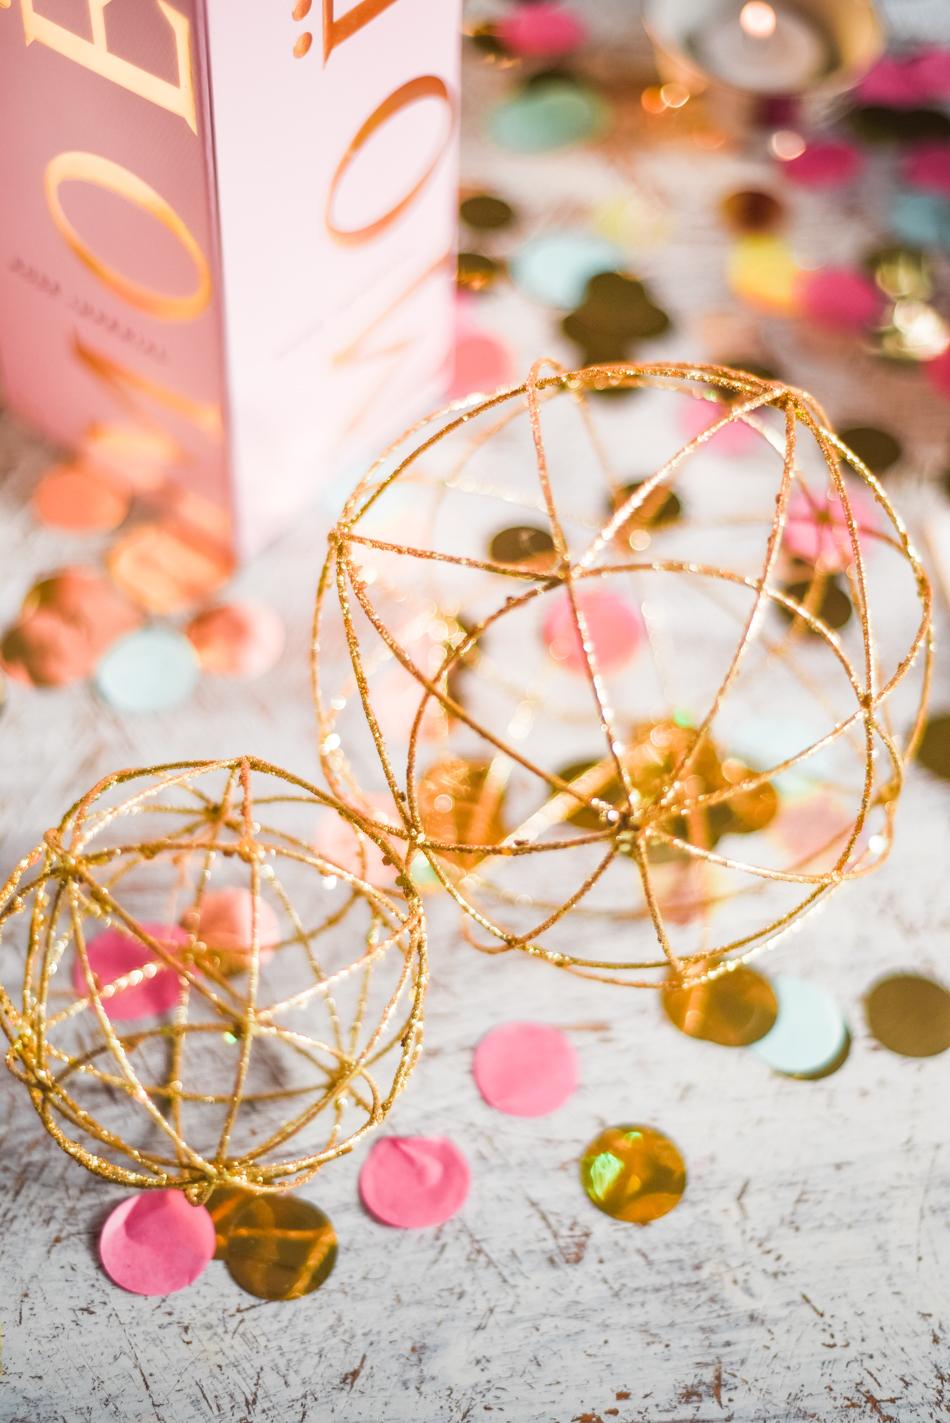 Valentinesday-table-setting-decor-styling-AnaisStoelen-4.jpg